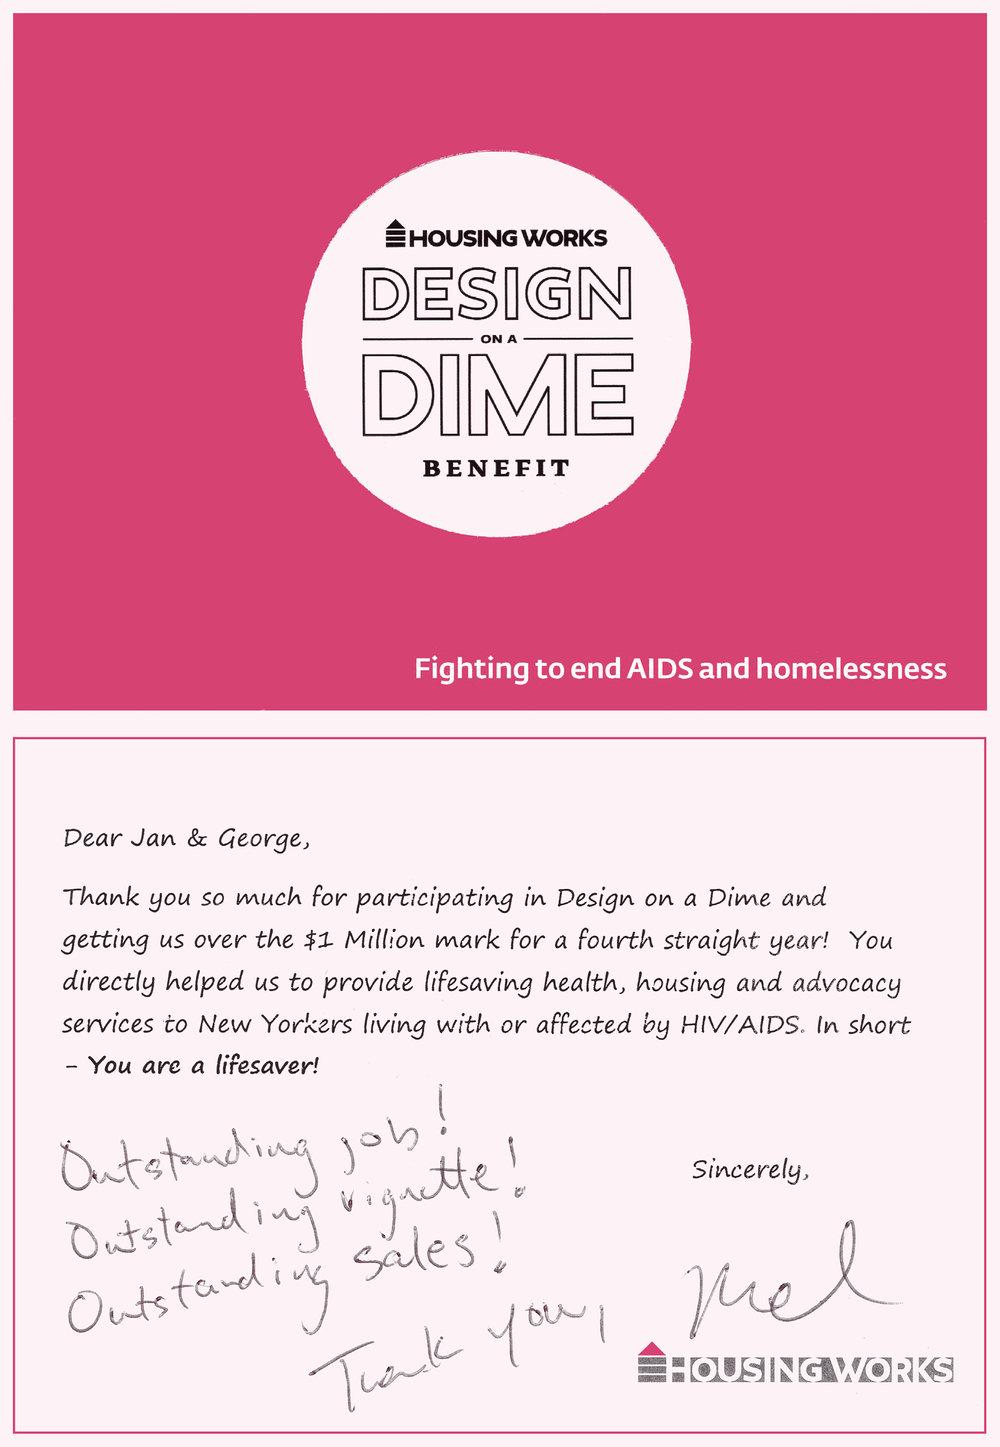 Interior Design On A Dime design on a dime 2017 — jangeorge